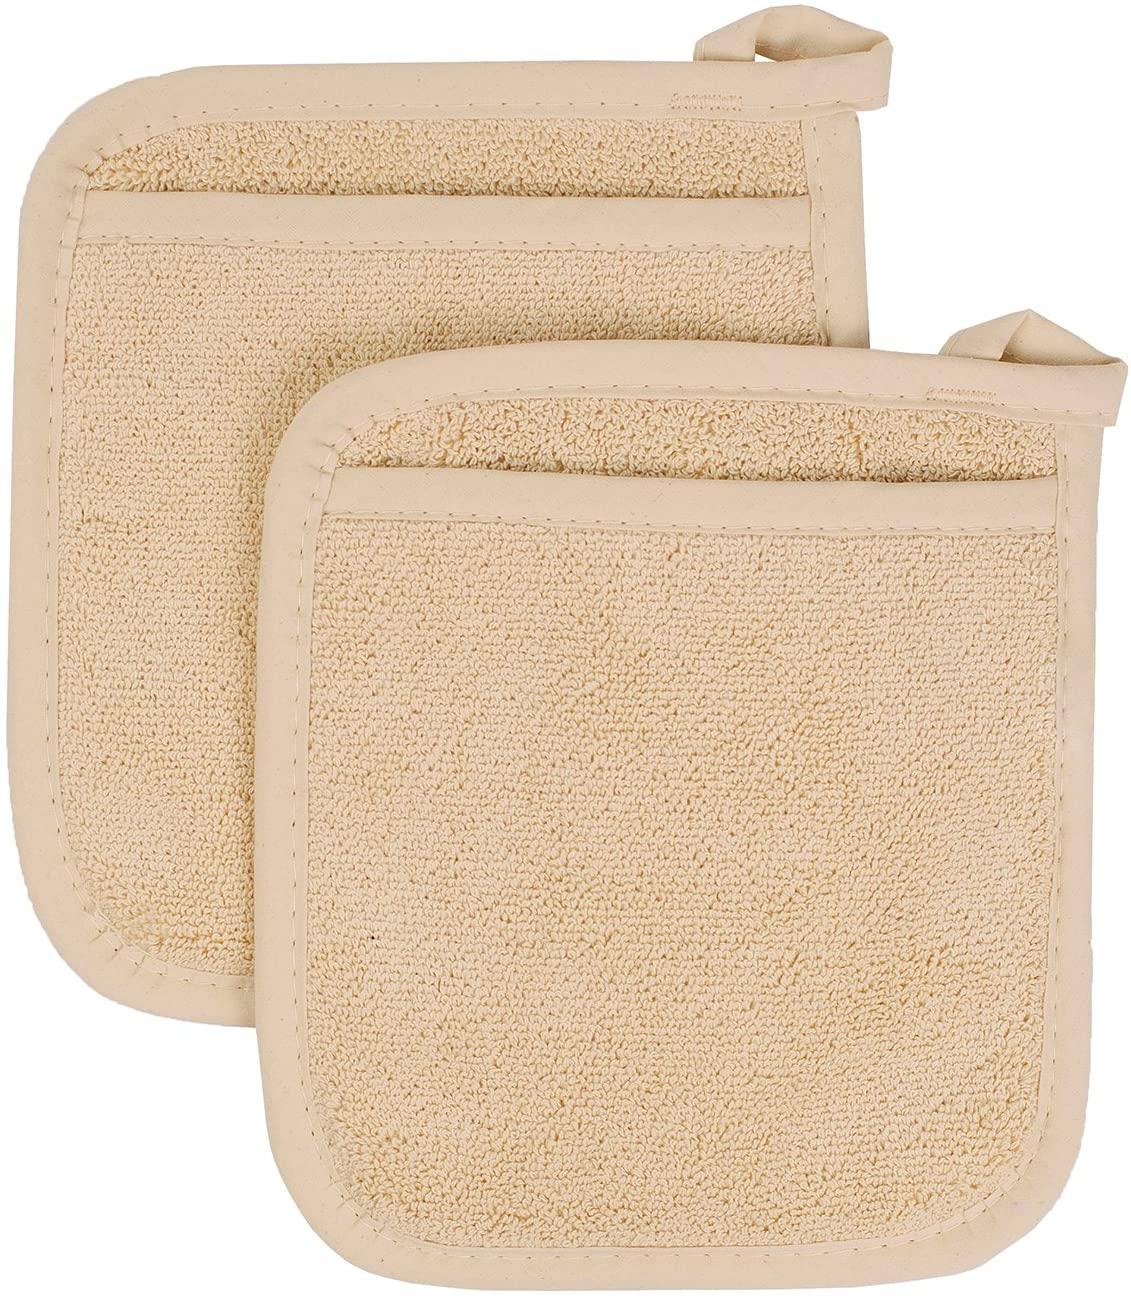 Ritz Royale Collection 100% Cotton Terry Cloth Pocket Mitt Set, Dual-Function Hot Pad/Pot Holder, 2-Piece, Latte